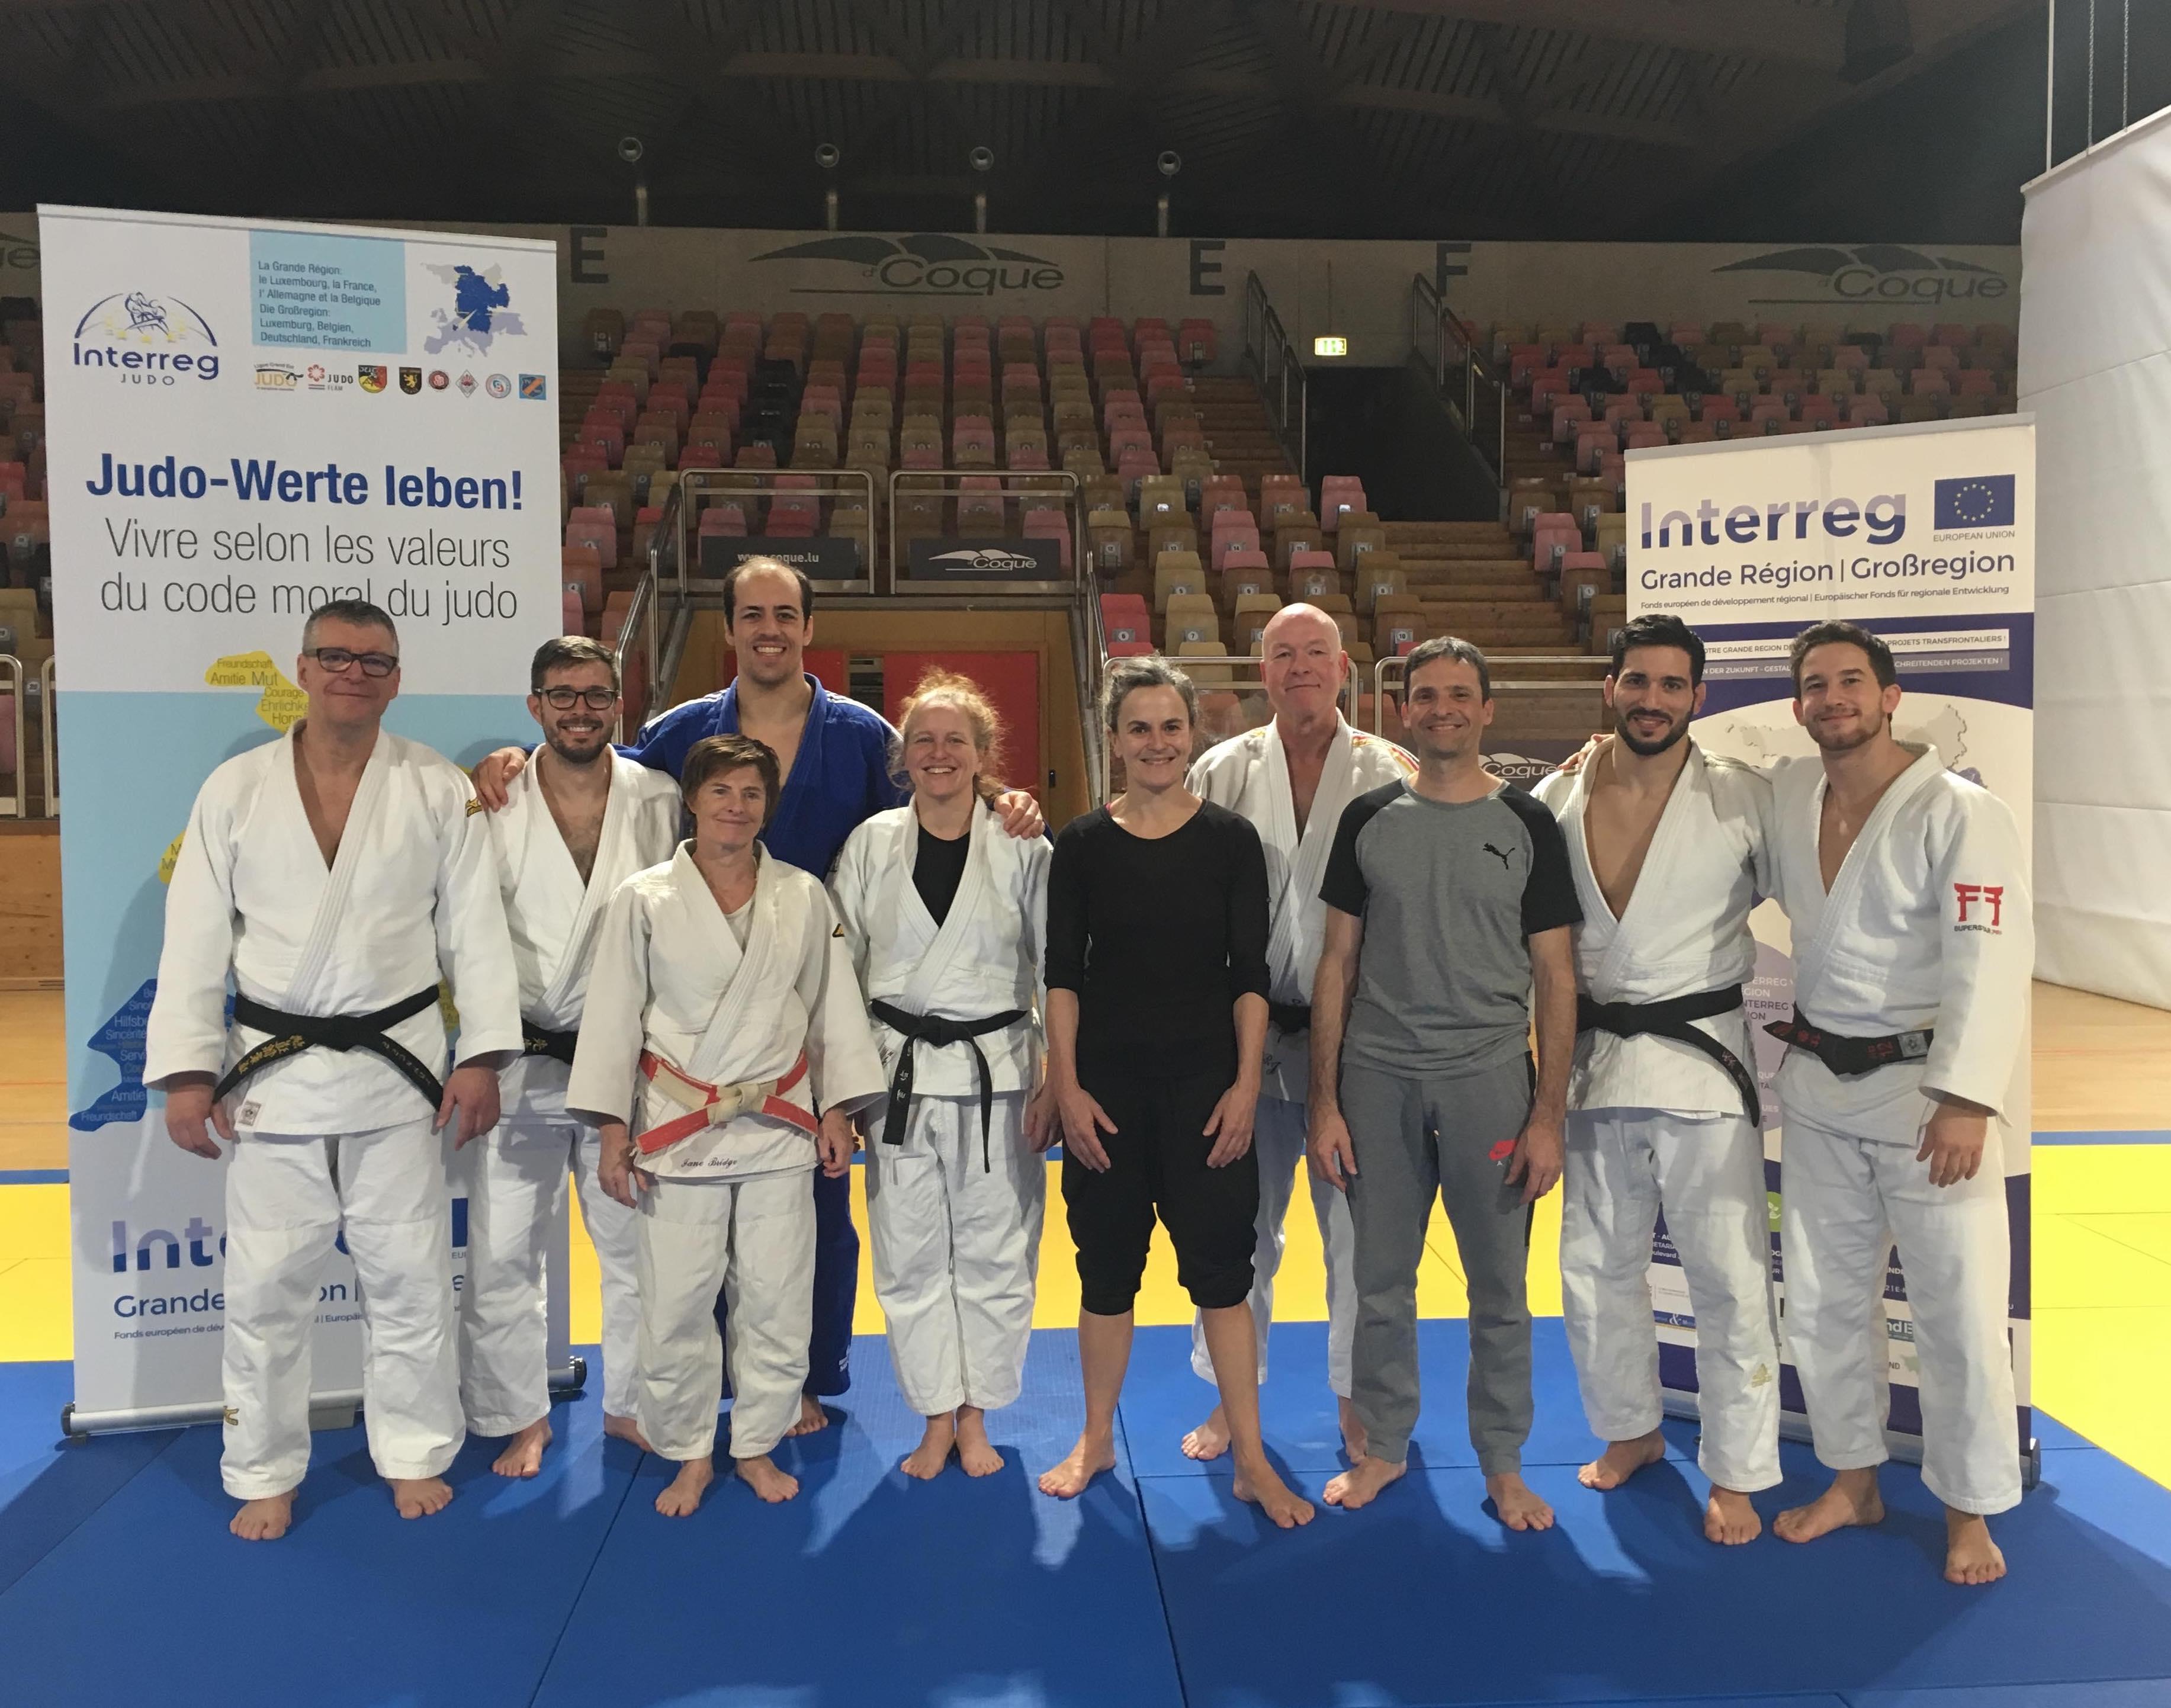 Interreg Judo Symposium - LTAD Luxembourg - 25-27.01.2019